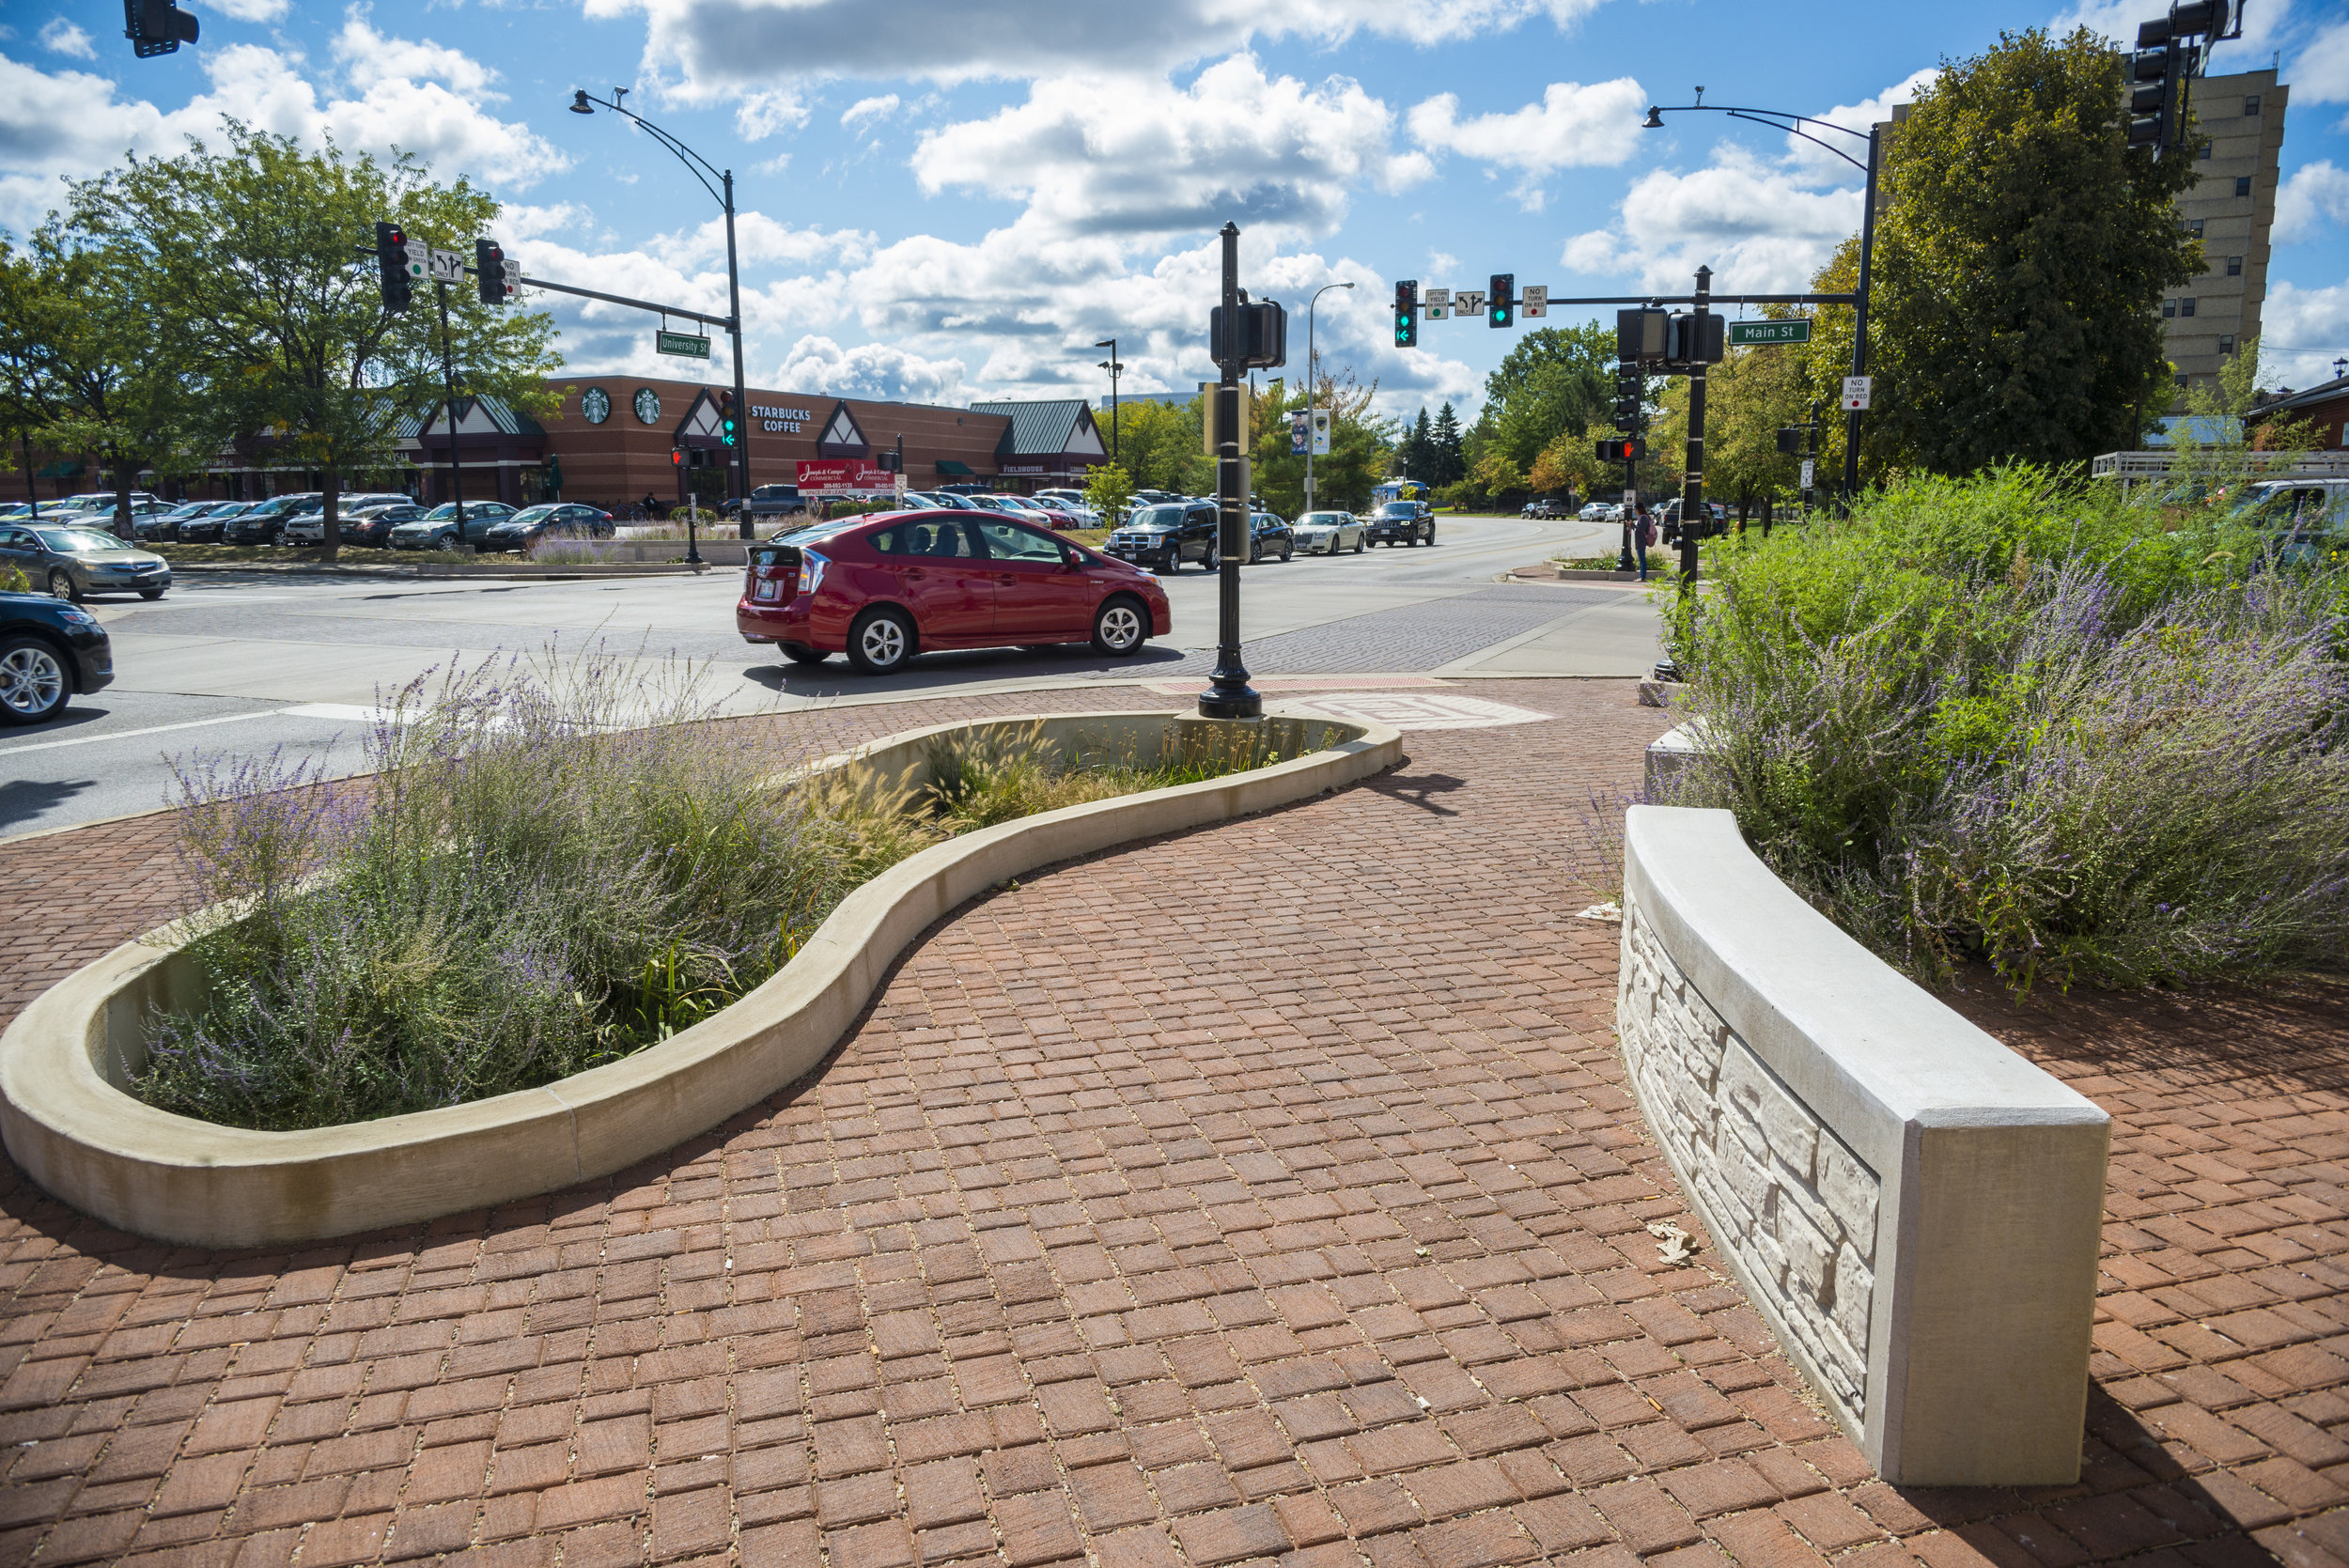 Main & University Intersection Improvements